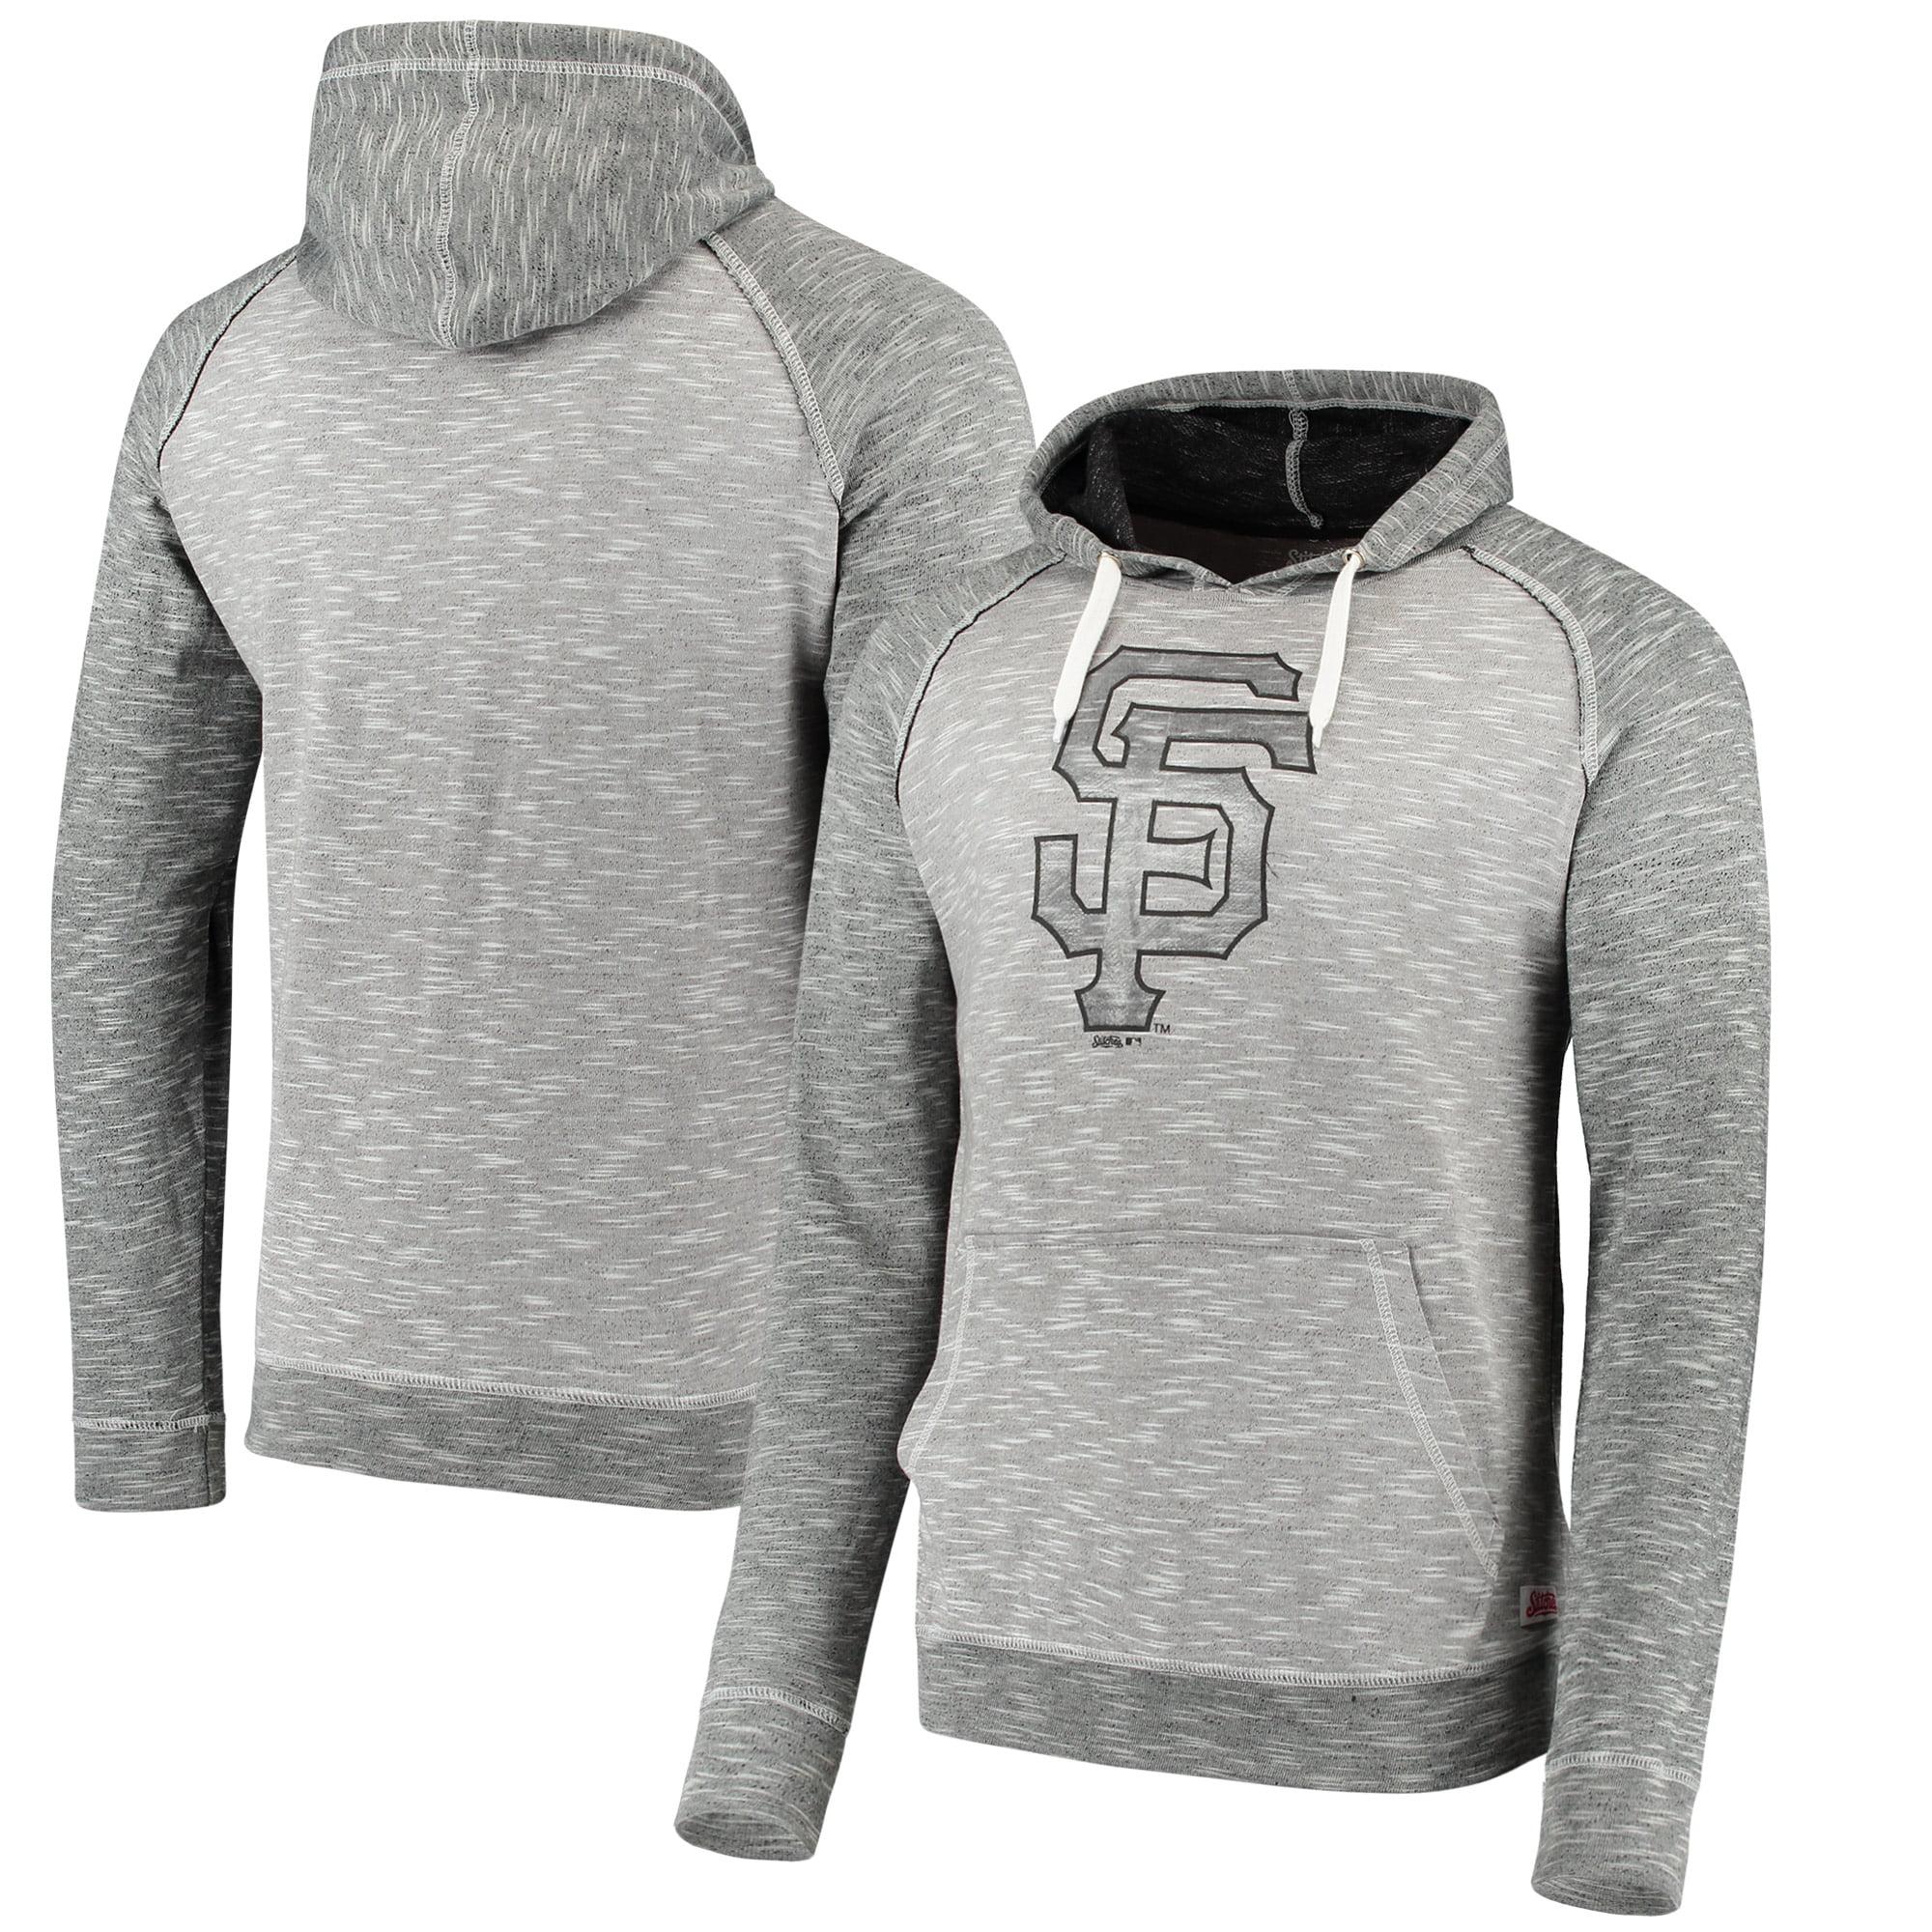 San Francisco Giants Stitches Slub Terry Pullover Hoodie - Heathered Gray/Heathered Black